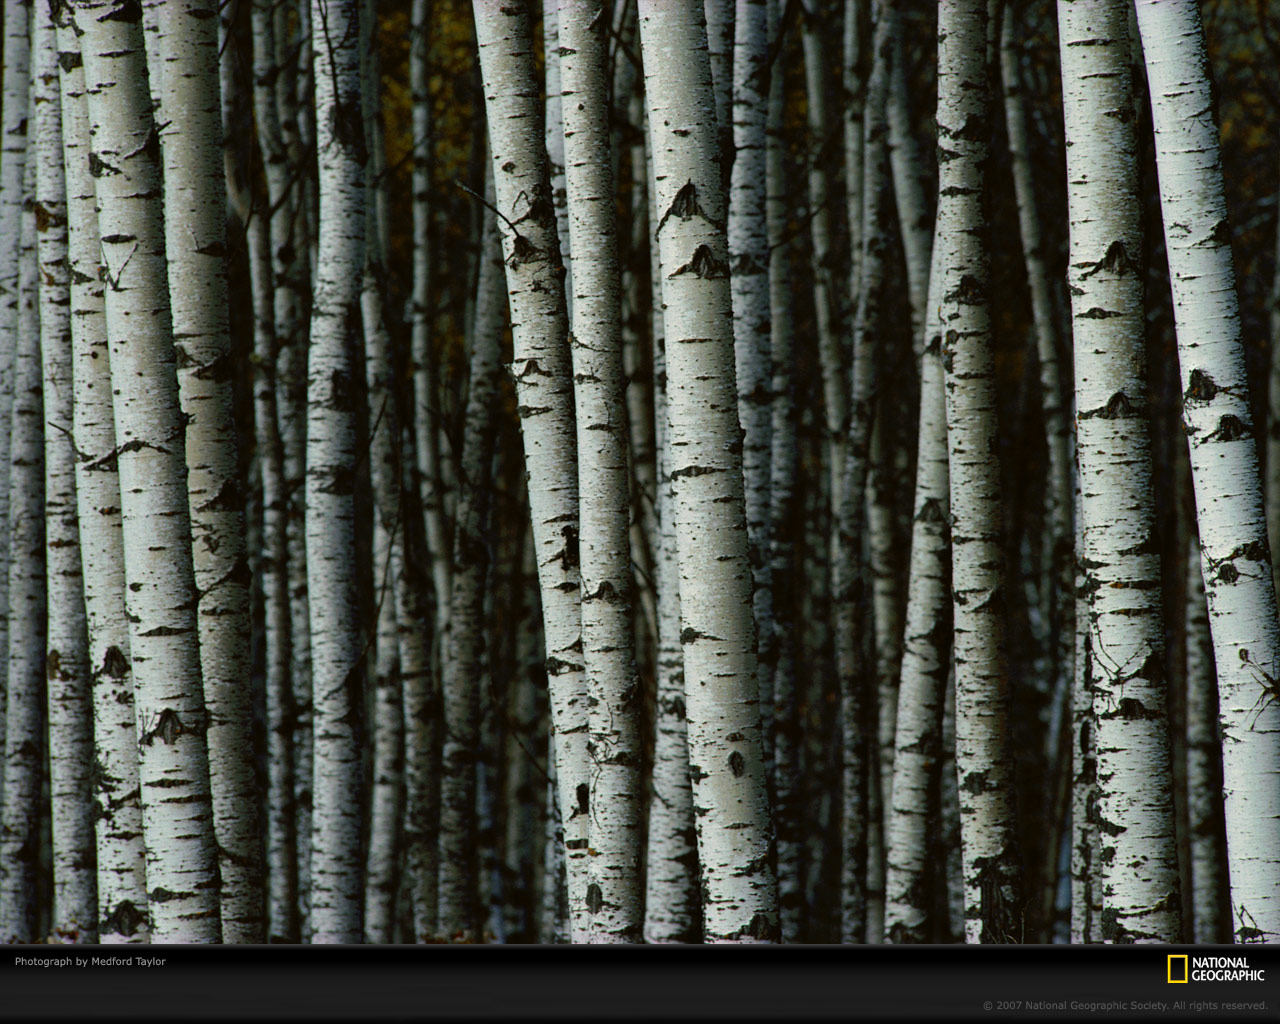 1280 x 1024 pixels—best for larger/widescreen monitors